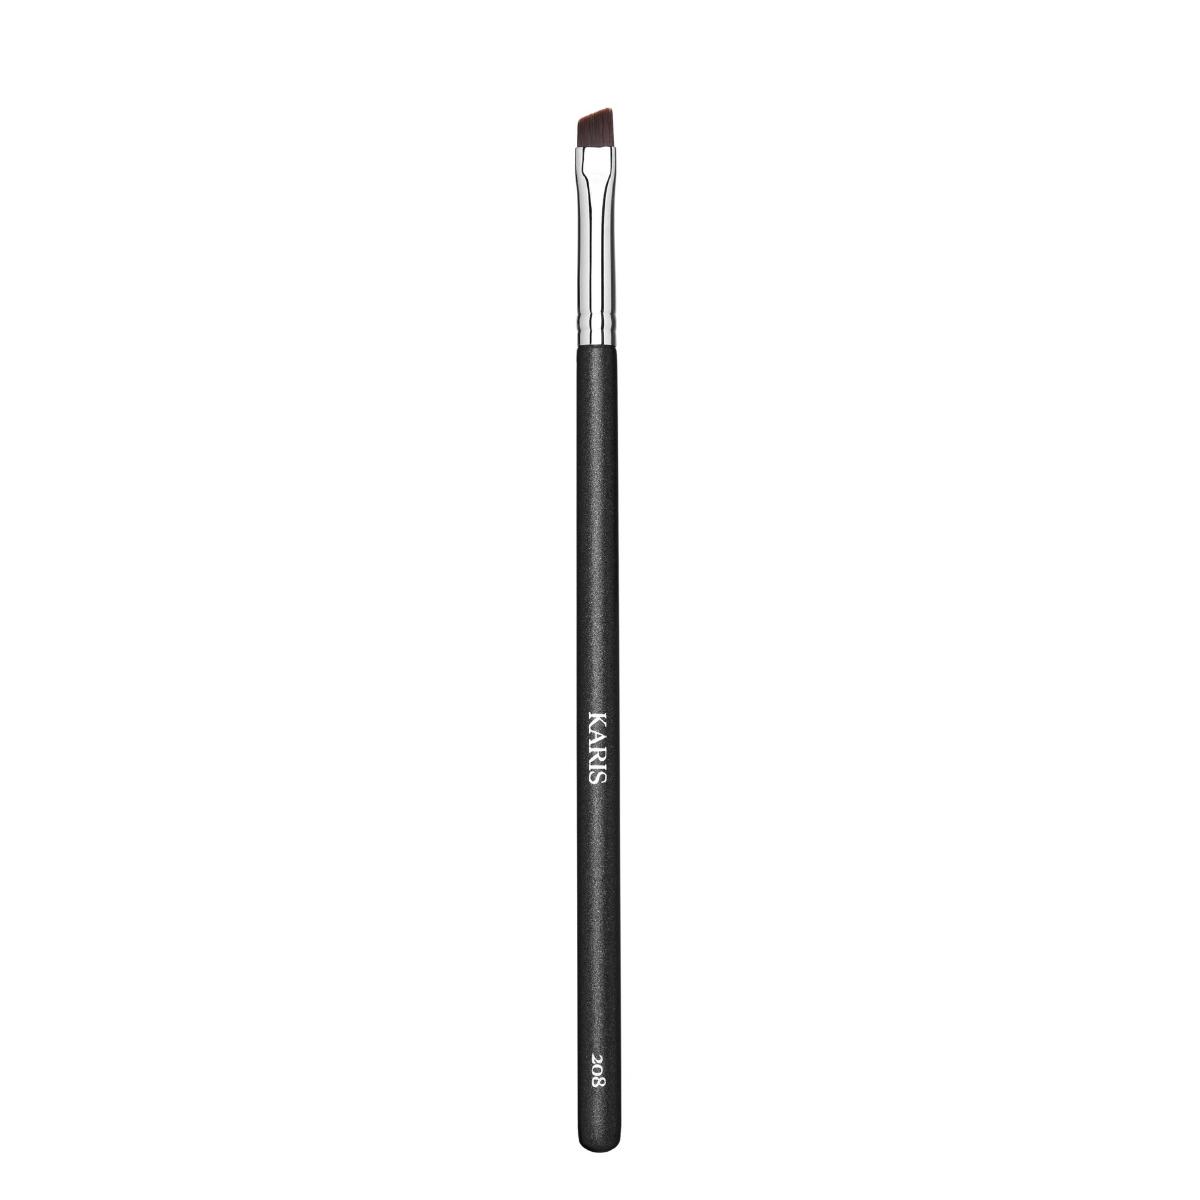 Karis Cosmetics 208 Fine Brow & Liner Brush